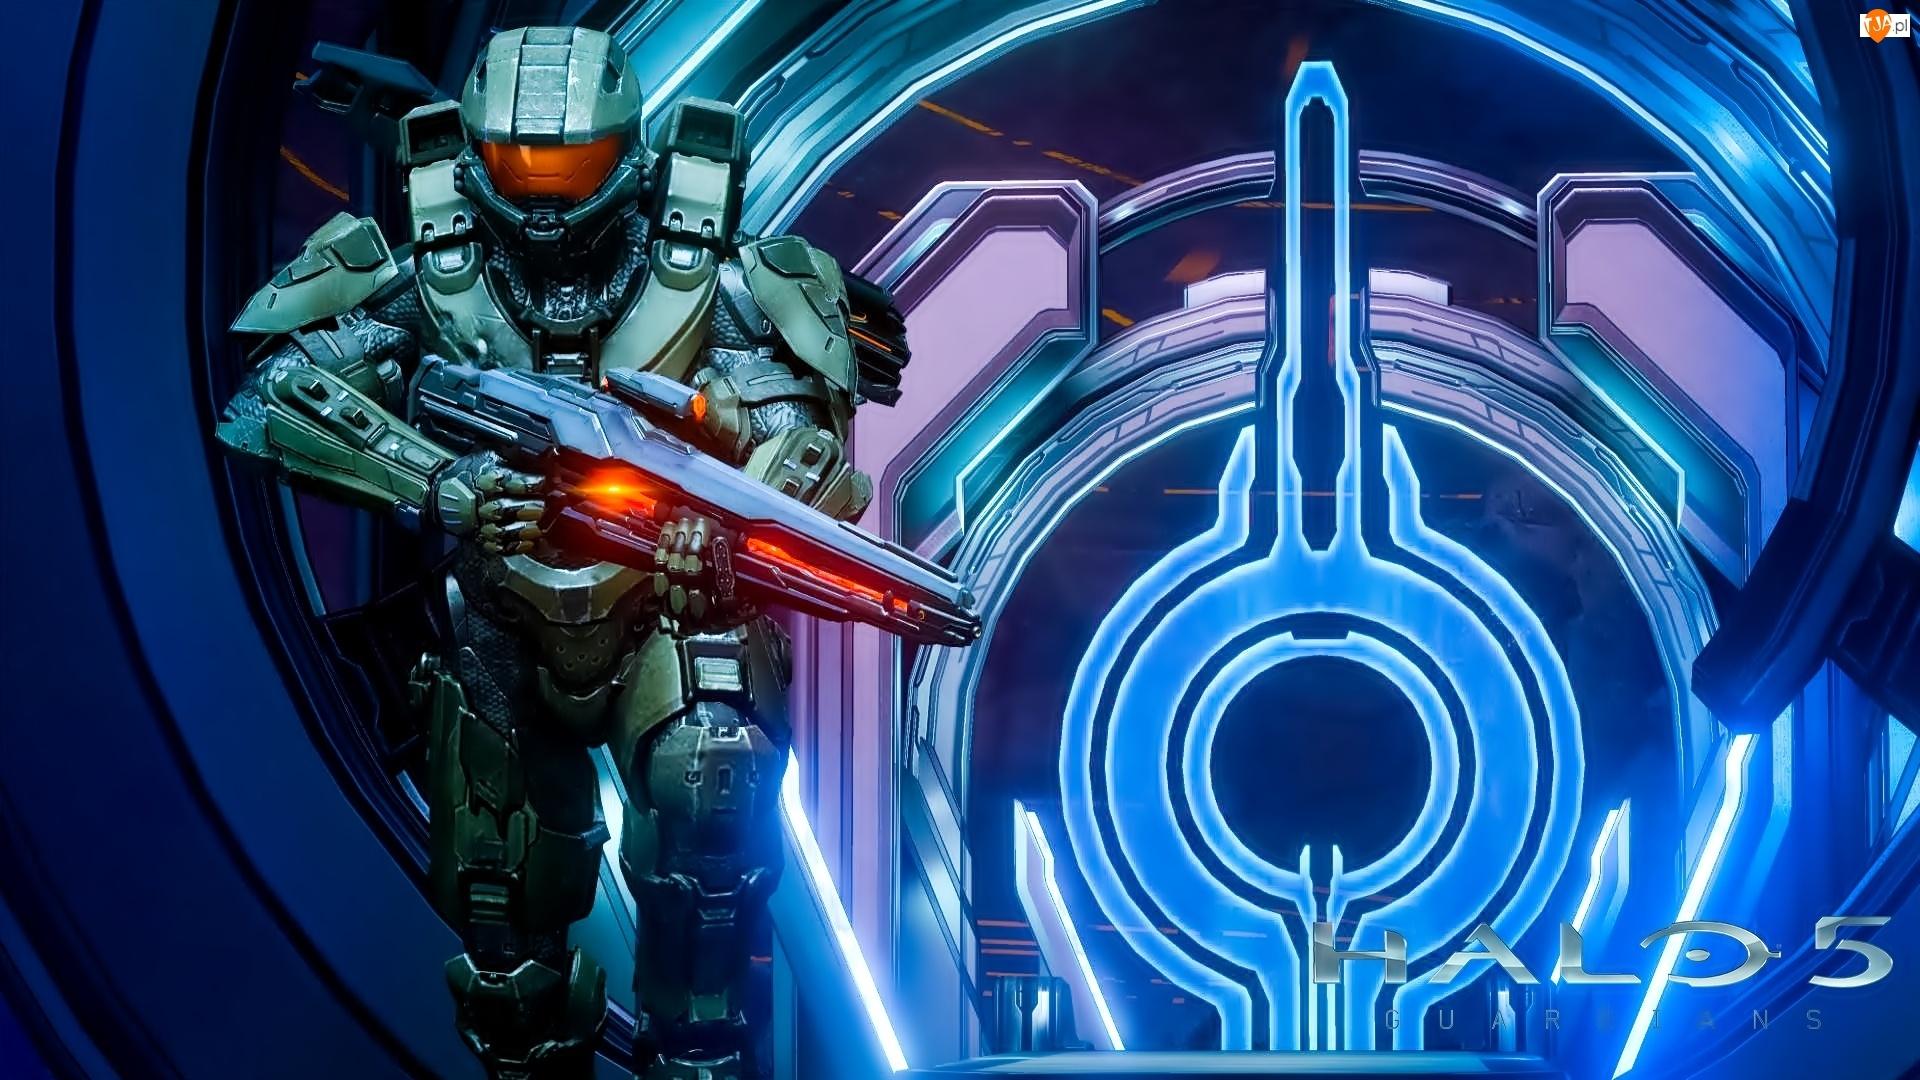 Halo 5, Guardians